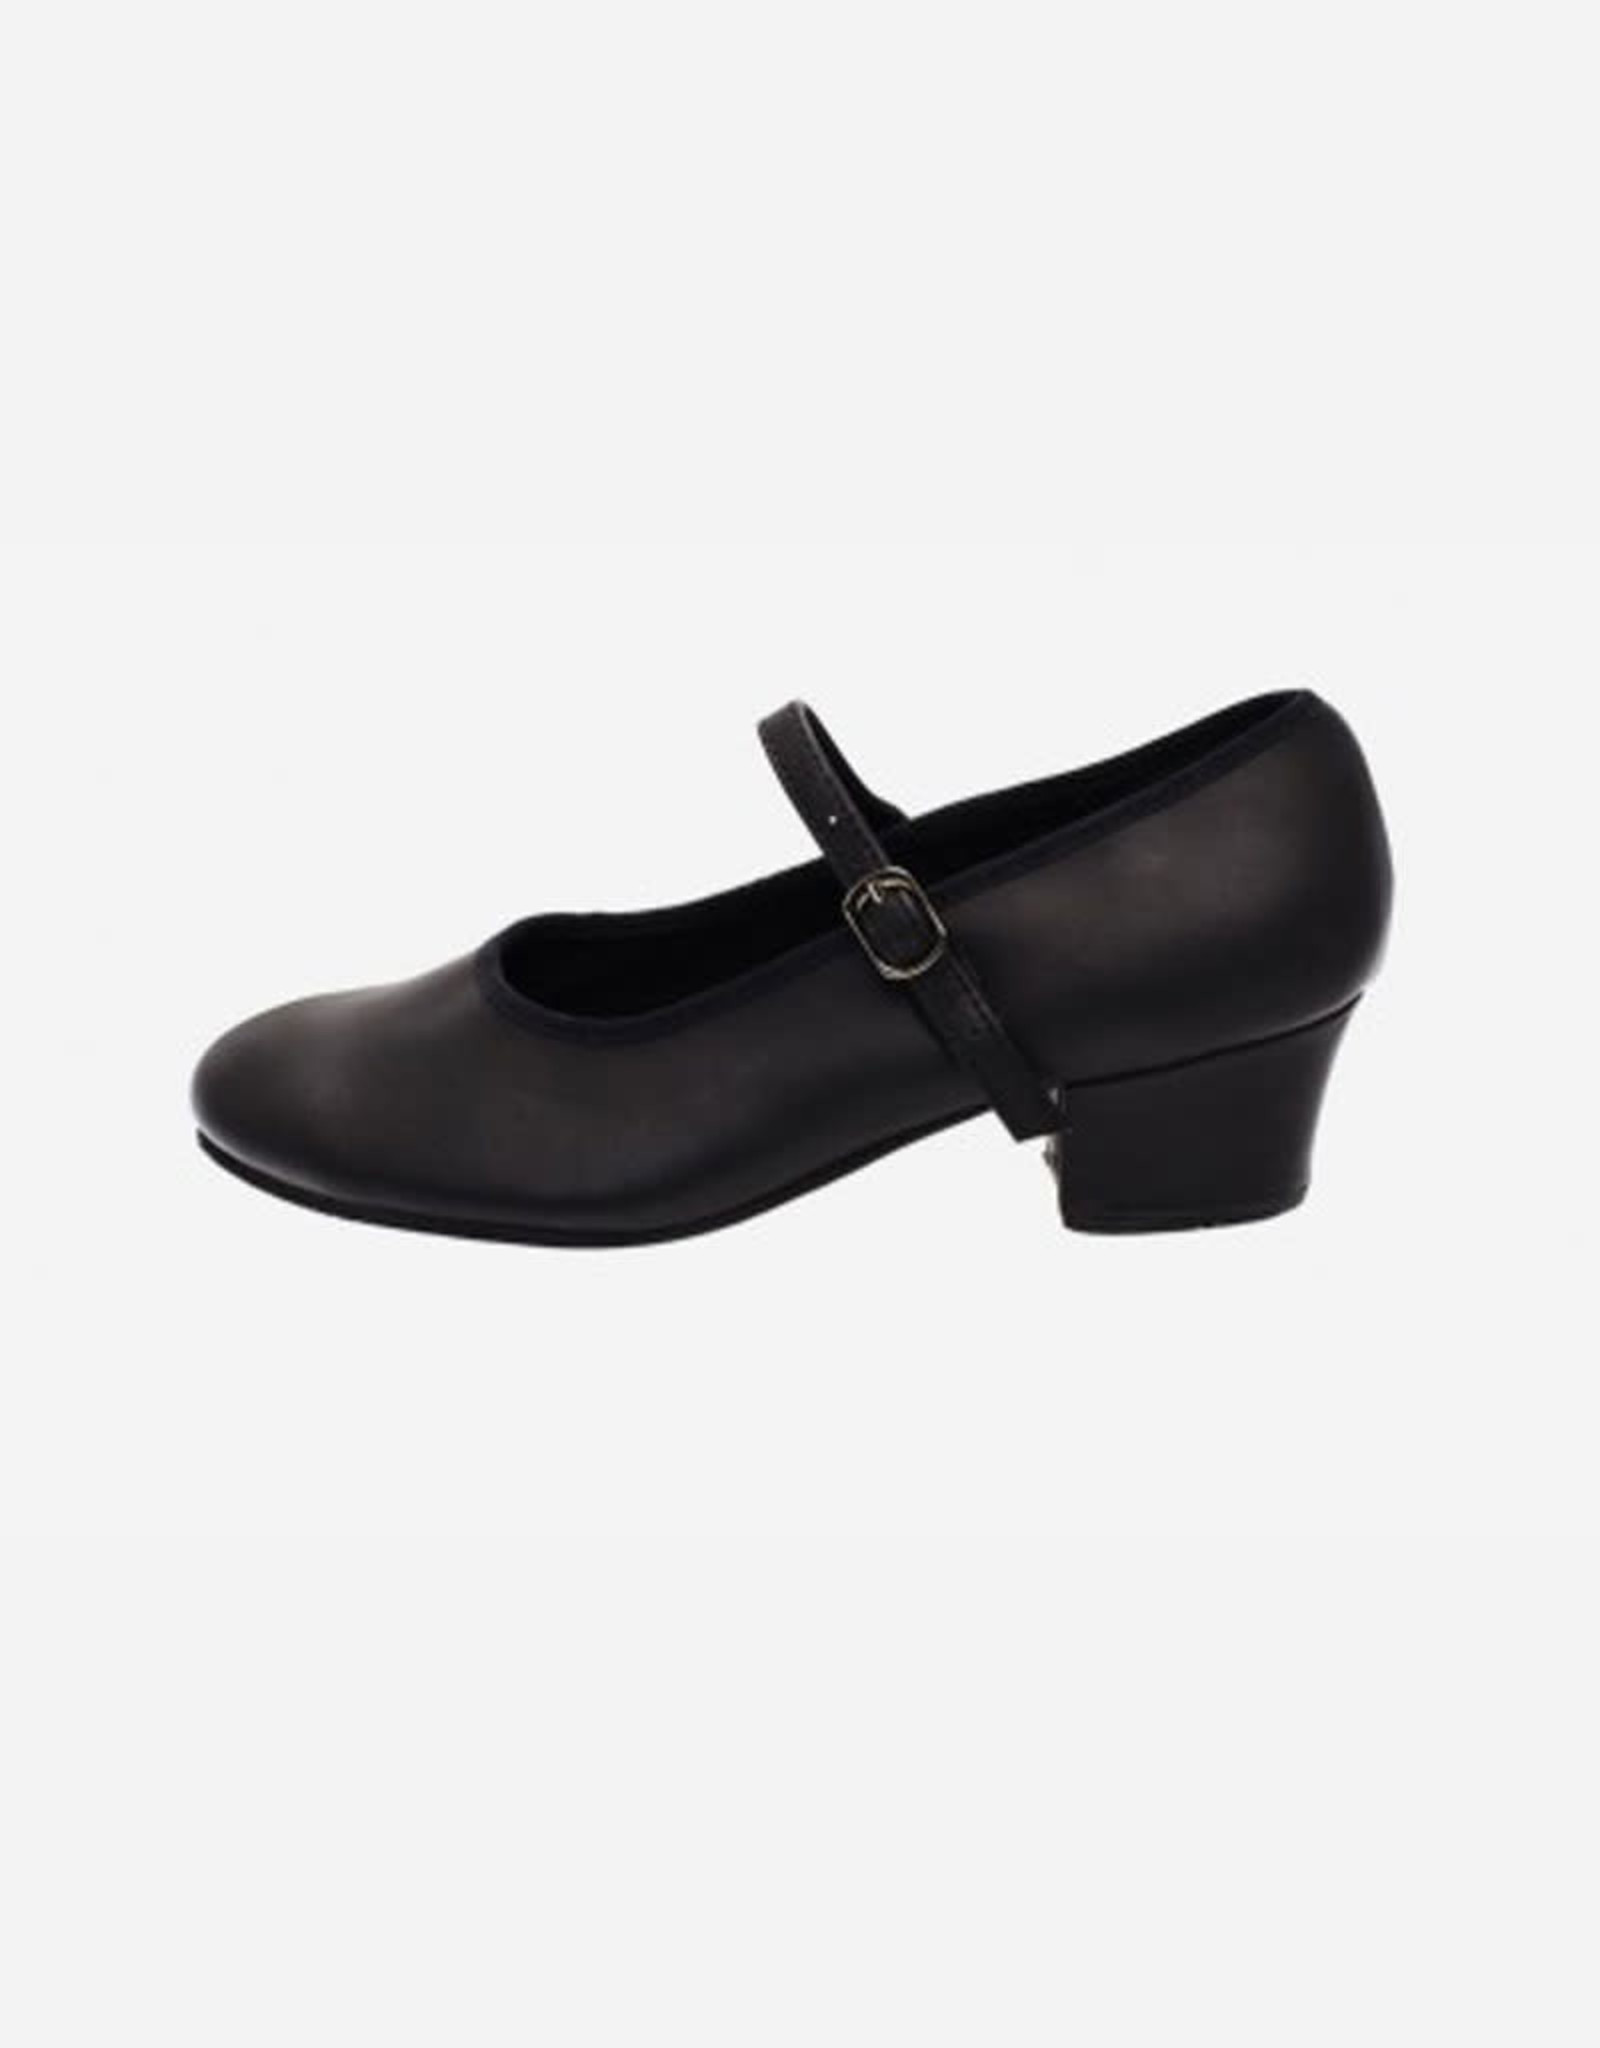 Sansha Moravia Shoes CL05